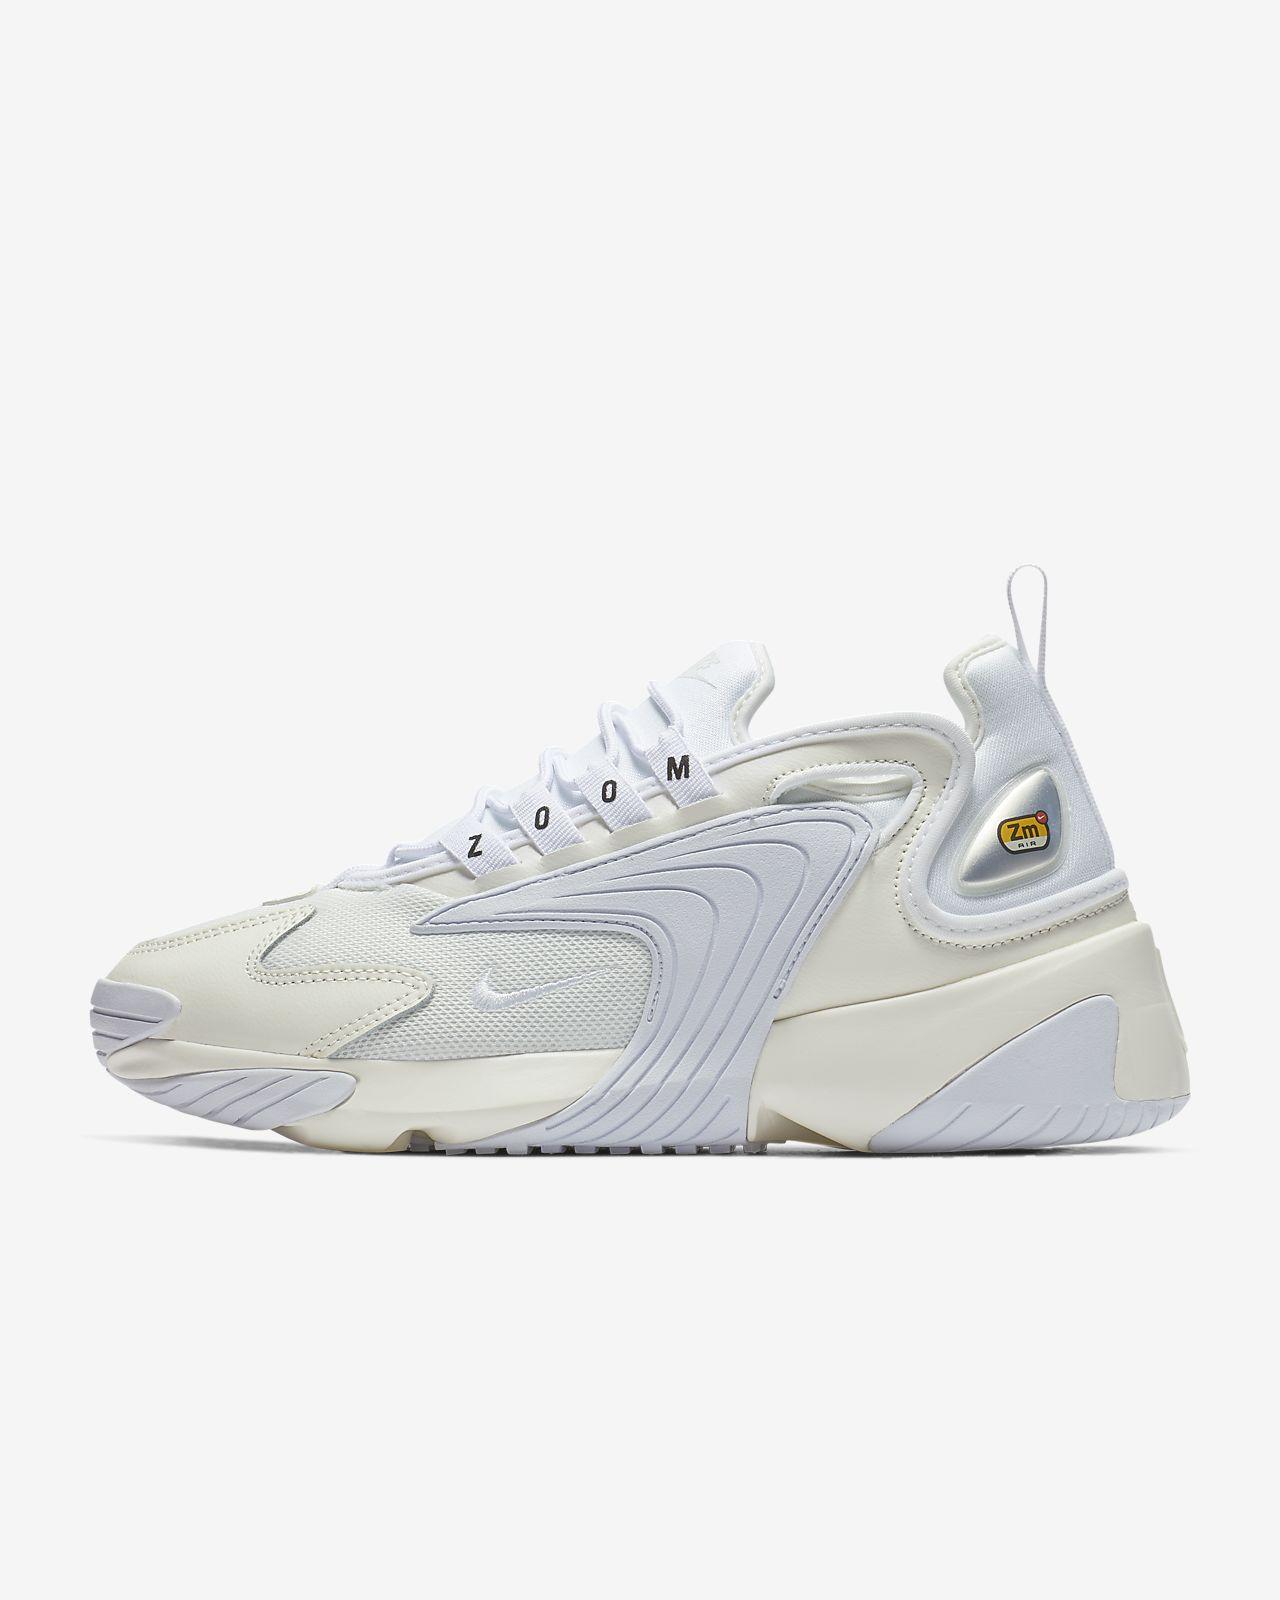 Nike Zoom 2k Womens Shoe